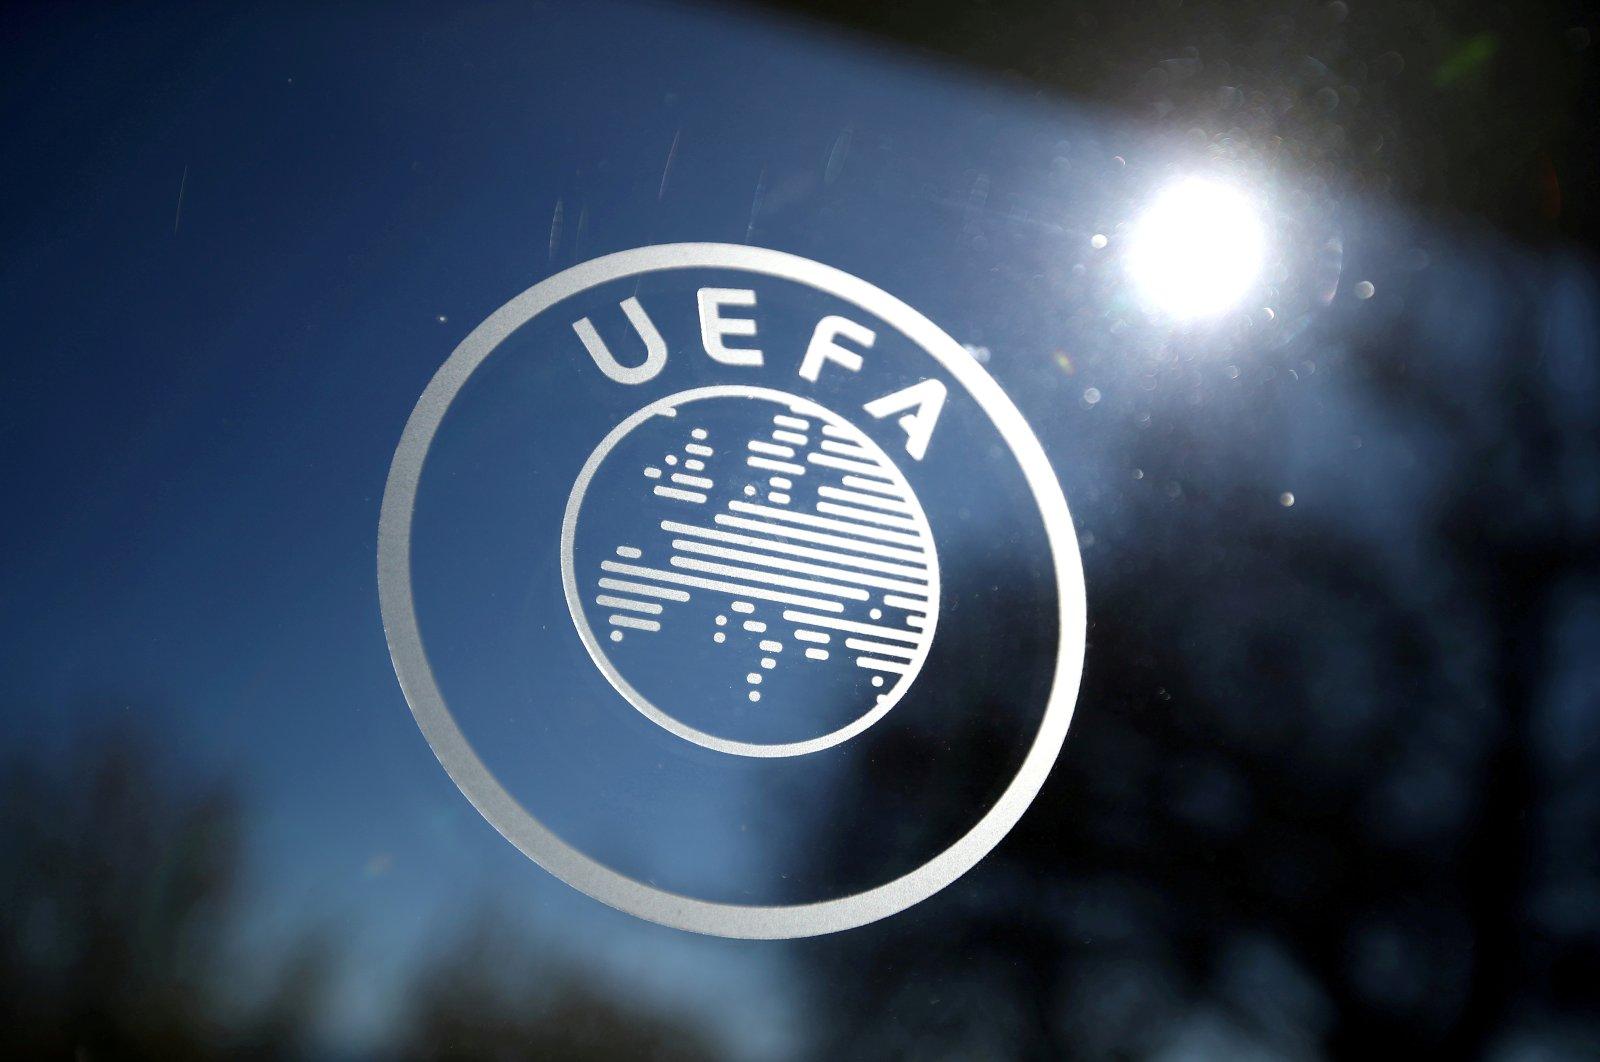 The UEFA logo displayed at the UEFA Headquarters in Nyon, Switzerland, Feb. 28, 2020. (Reuters Photo)